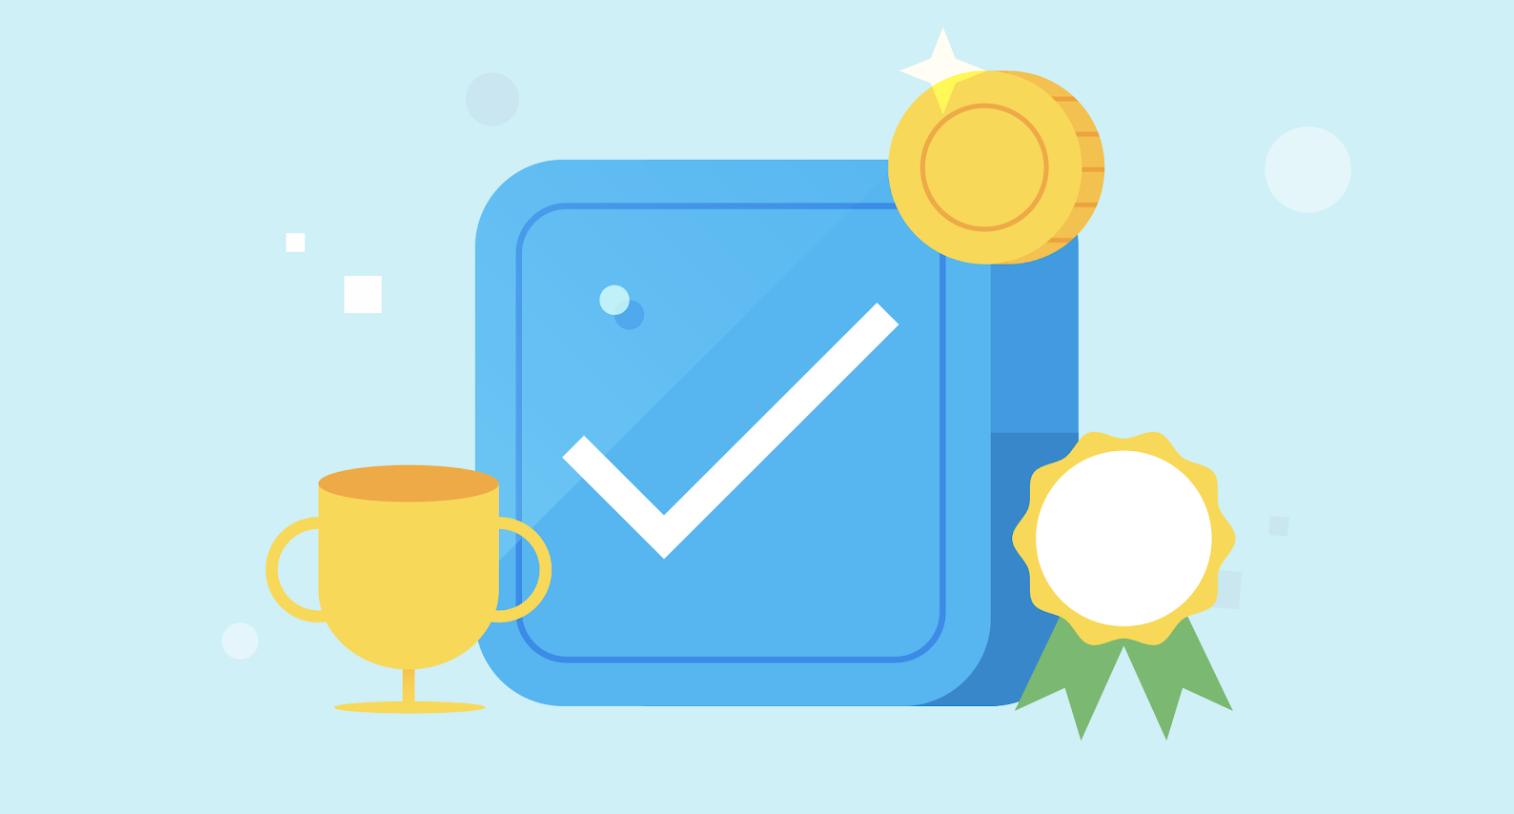 Experiment with app rewards